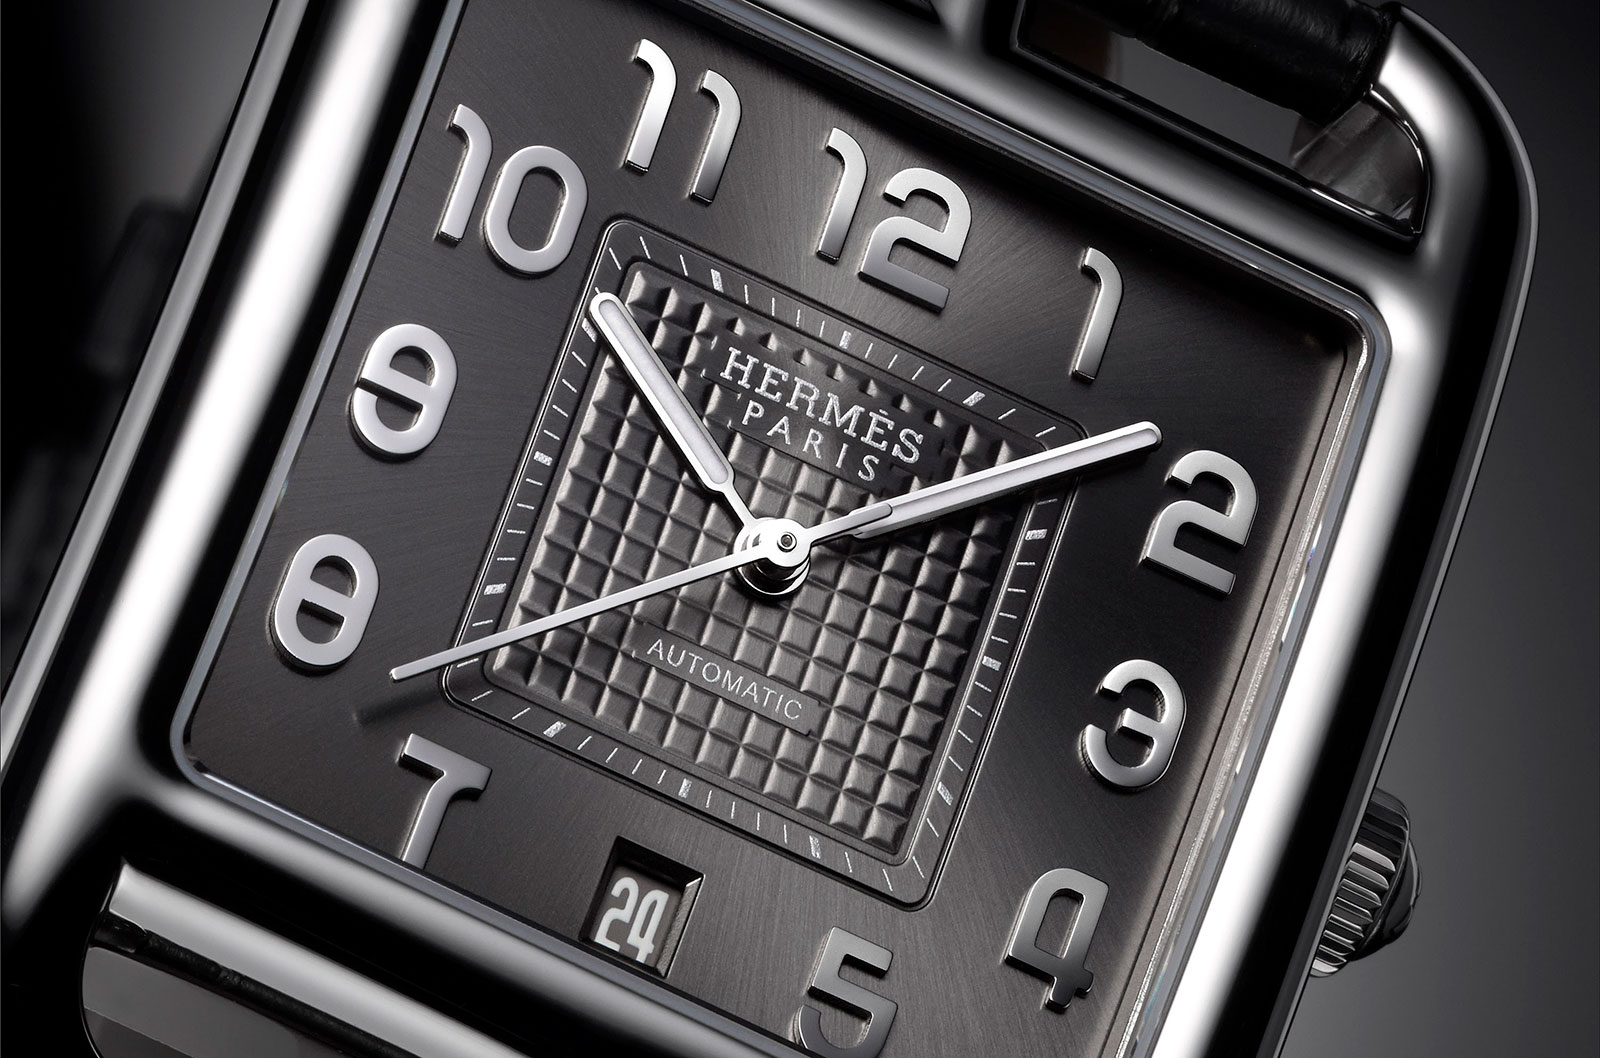 e4f098ef6 Introducing the Hermes Cape Cod TGM Manufacture | SJX Watches